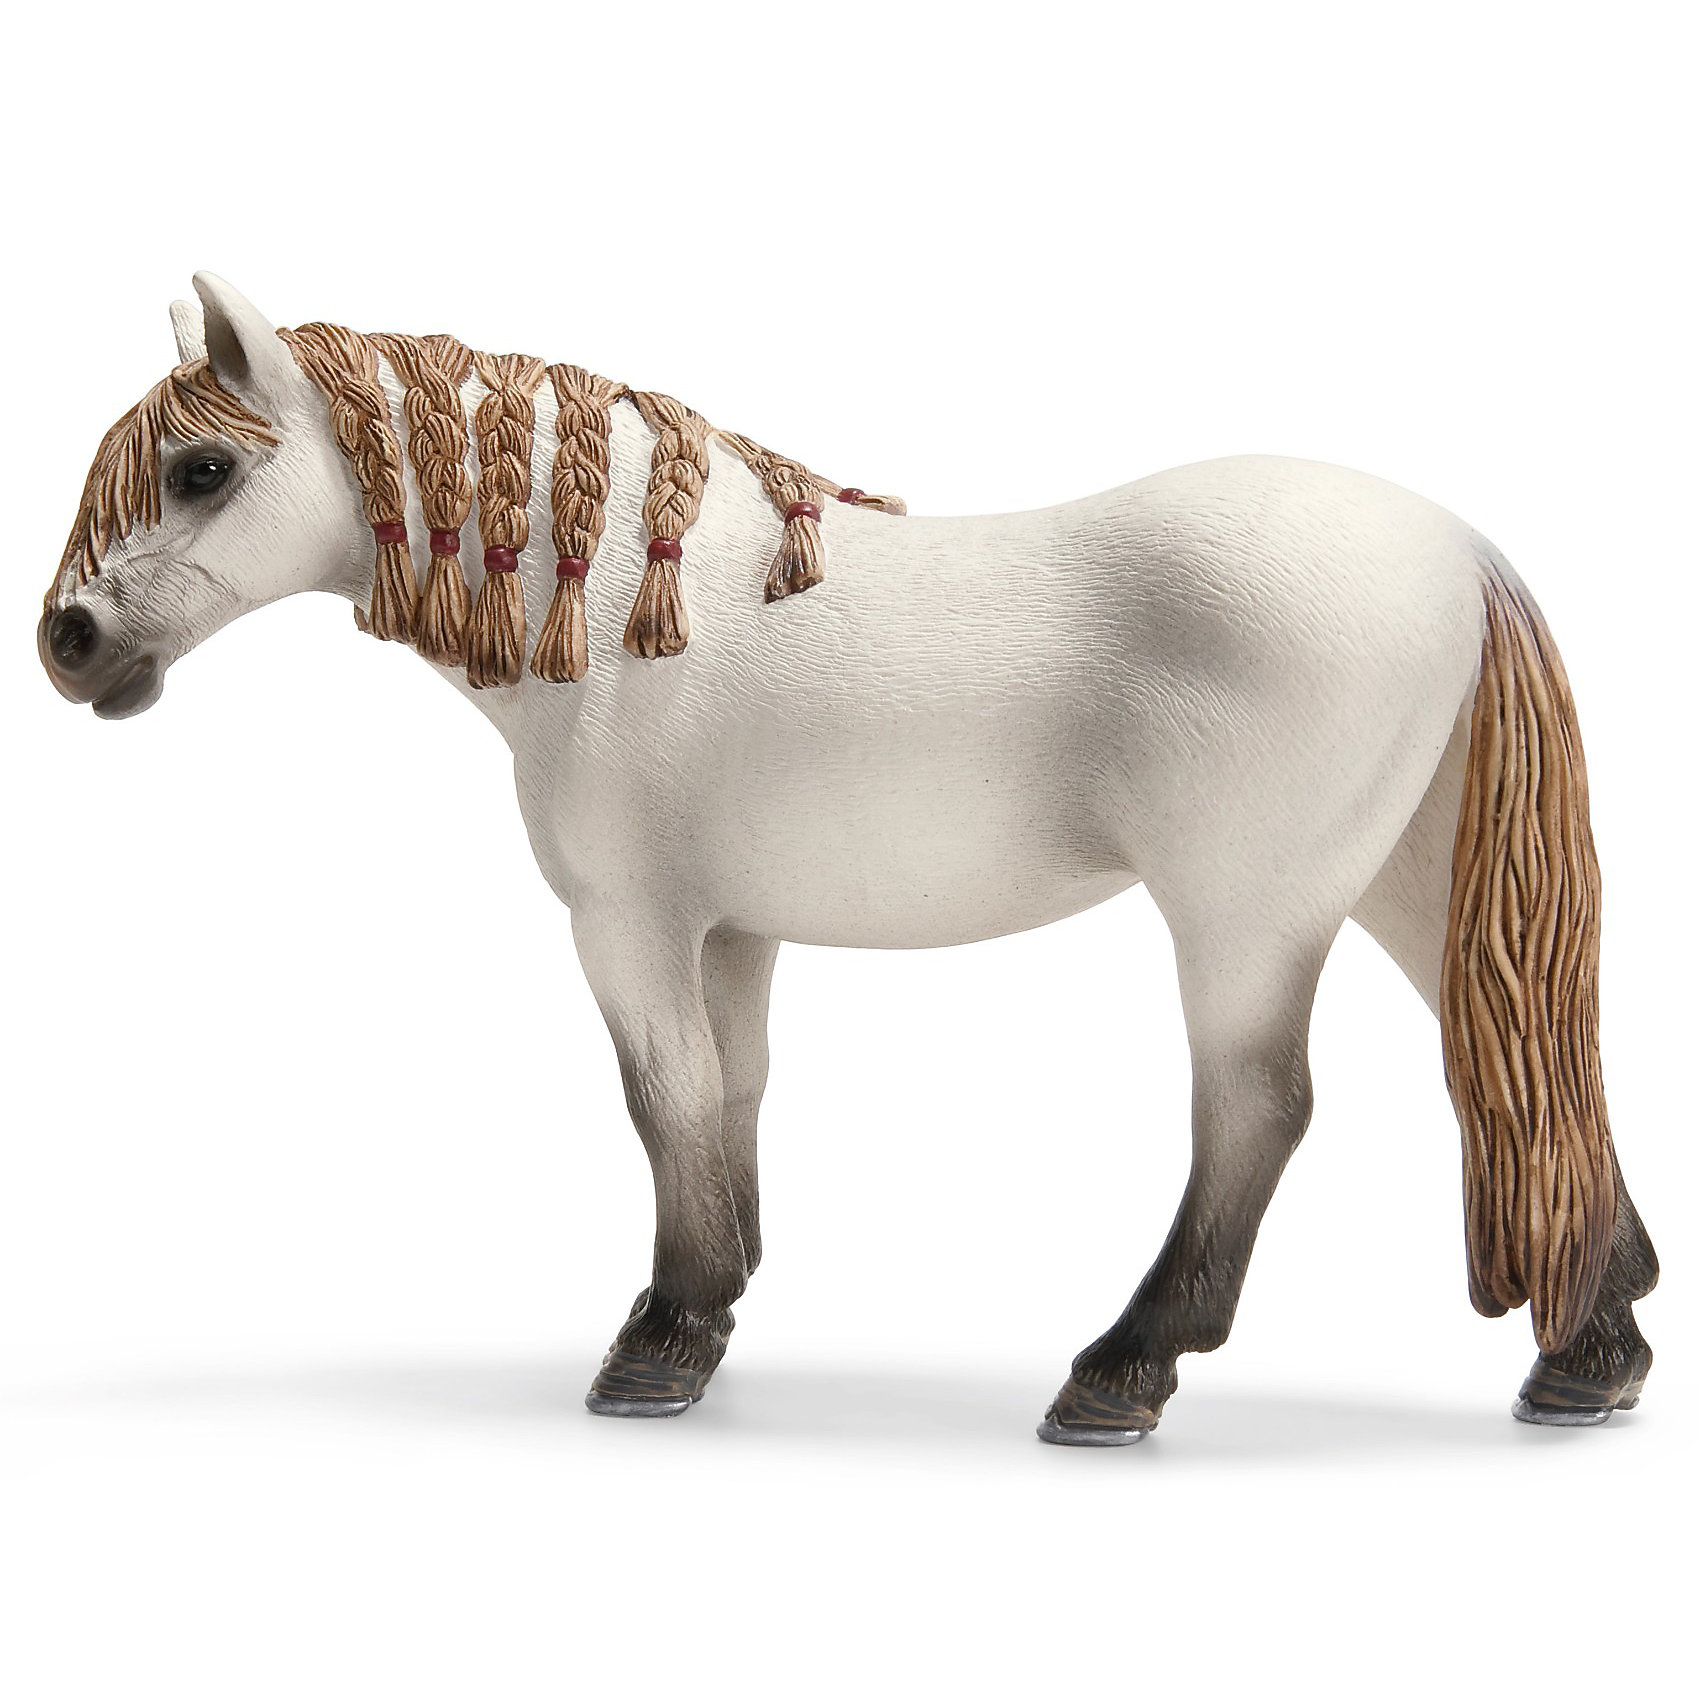 Schleich Кобыла андалузской породы. Серия Лошади, Schleich лен обл купить продать лошади